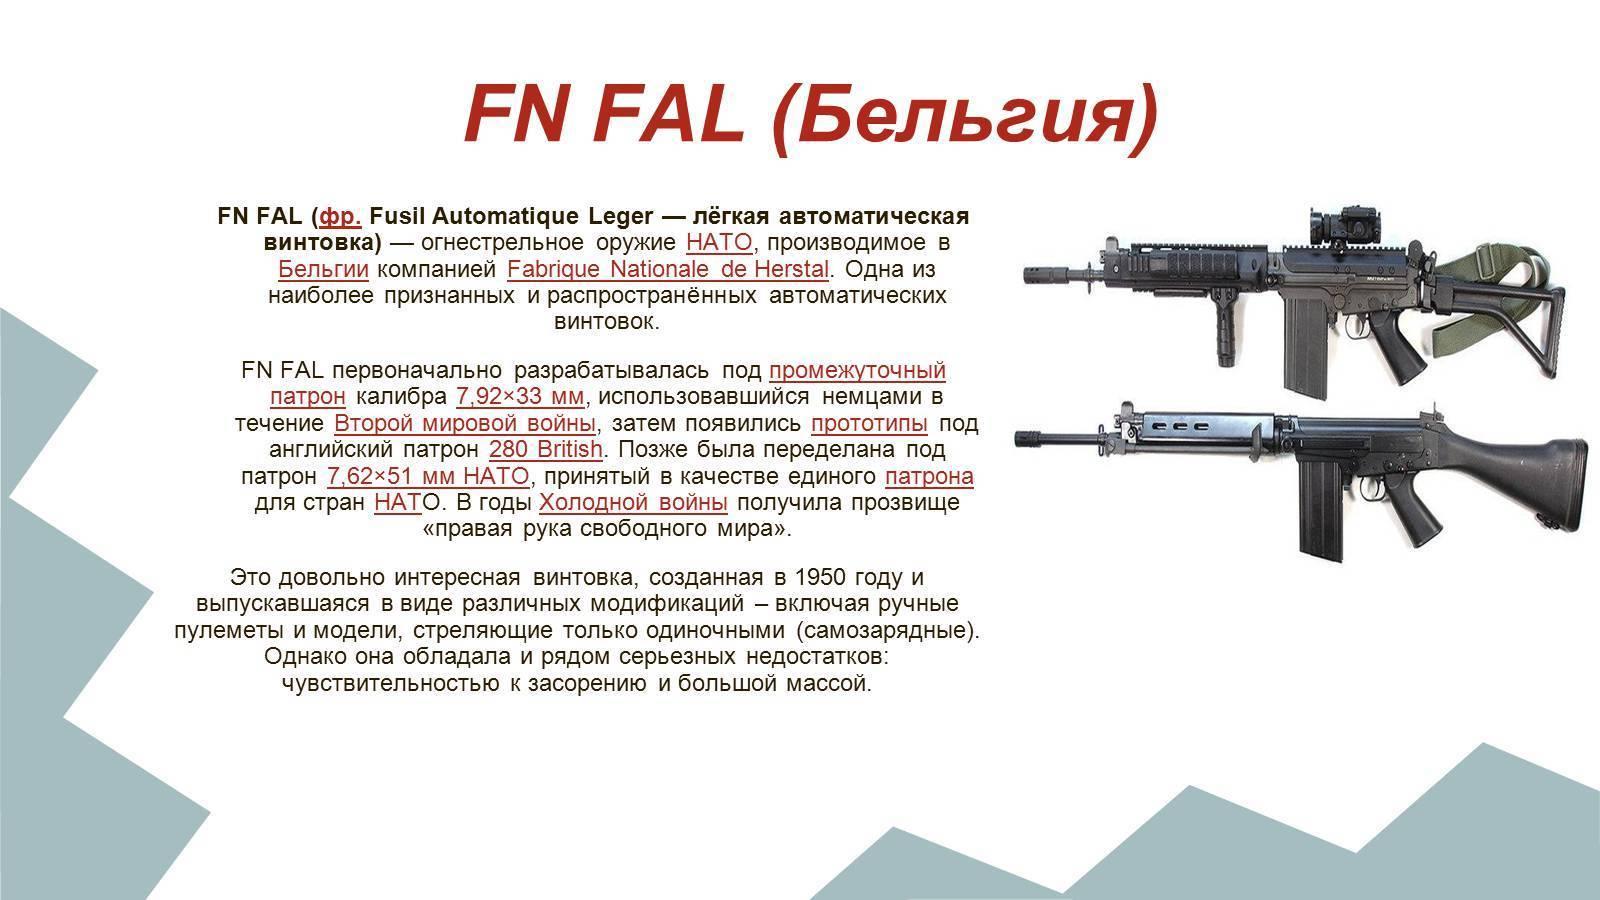 Fn fal — википедия